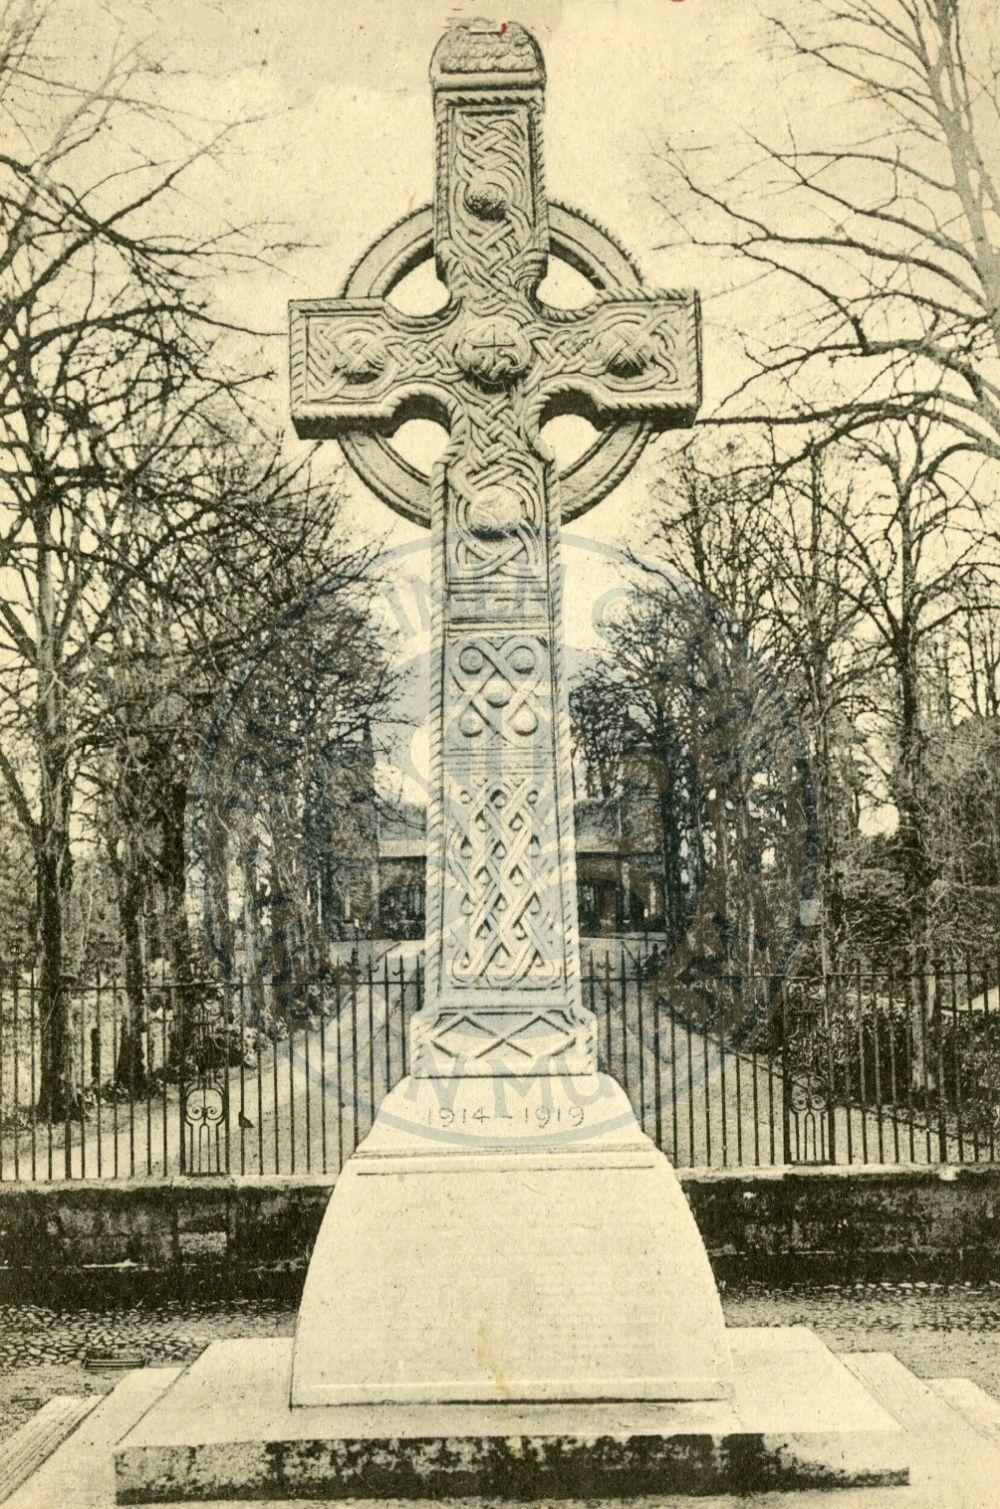 Hillsborough War Memorial - ILC&LM Collection